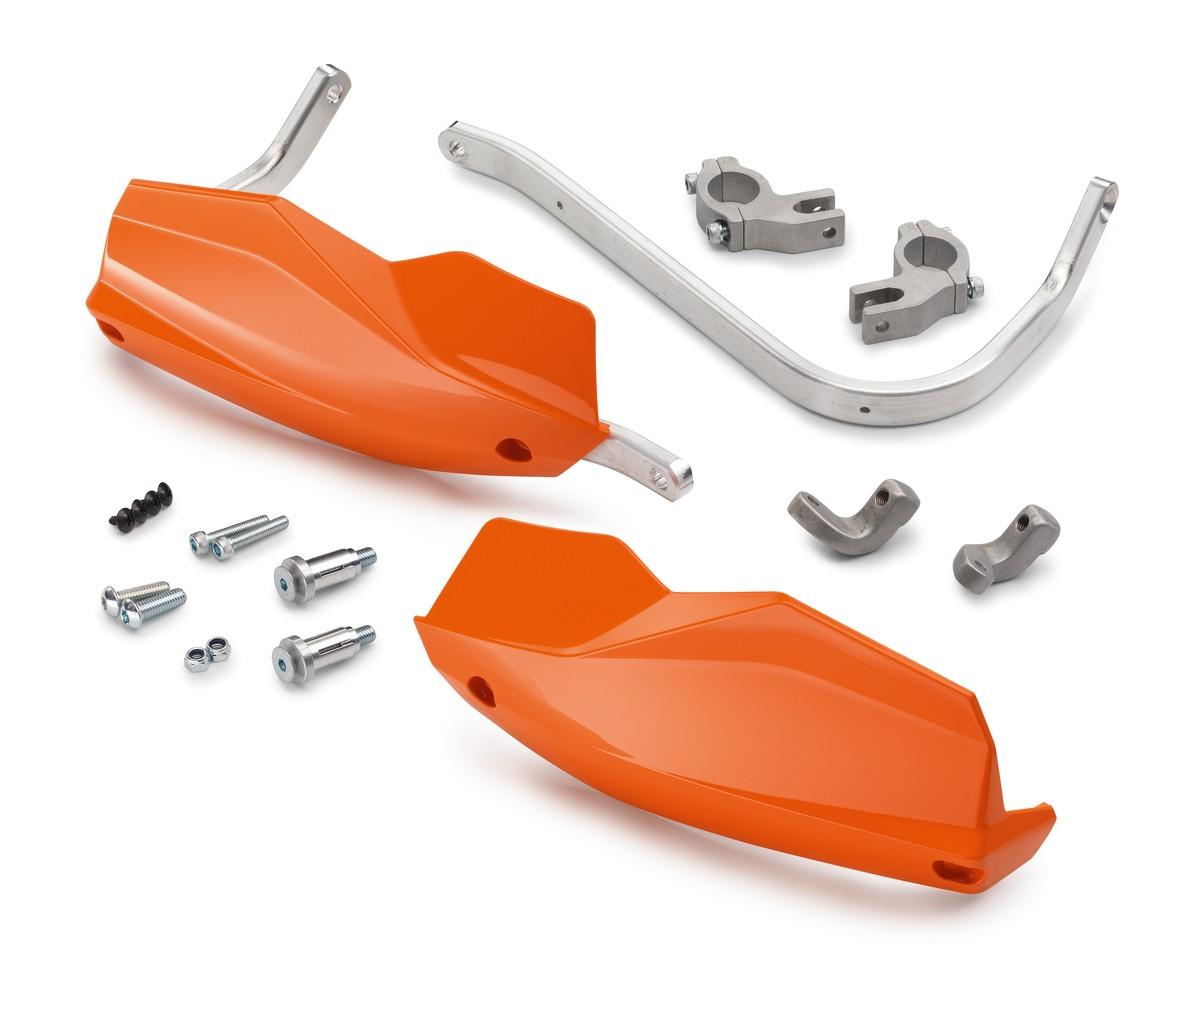 ktm aluminum handguards orange 1190 adv. Black Bedroom Furniture Sets. Home Design Ideas